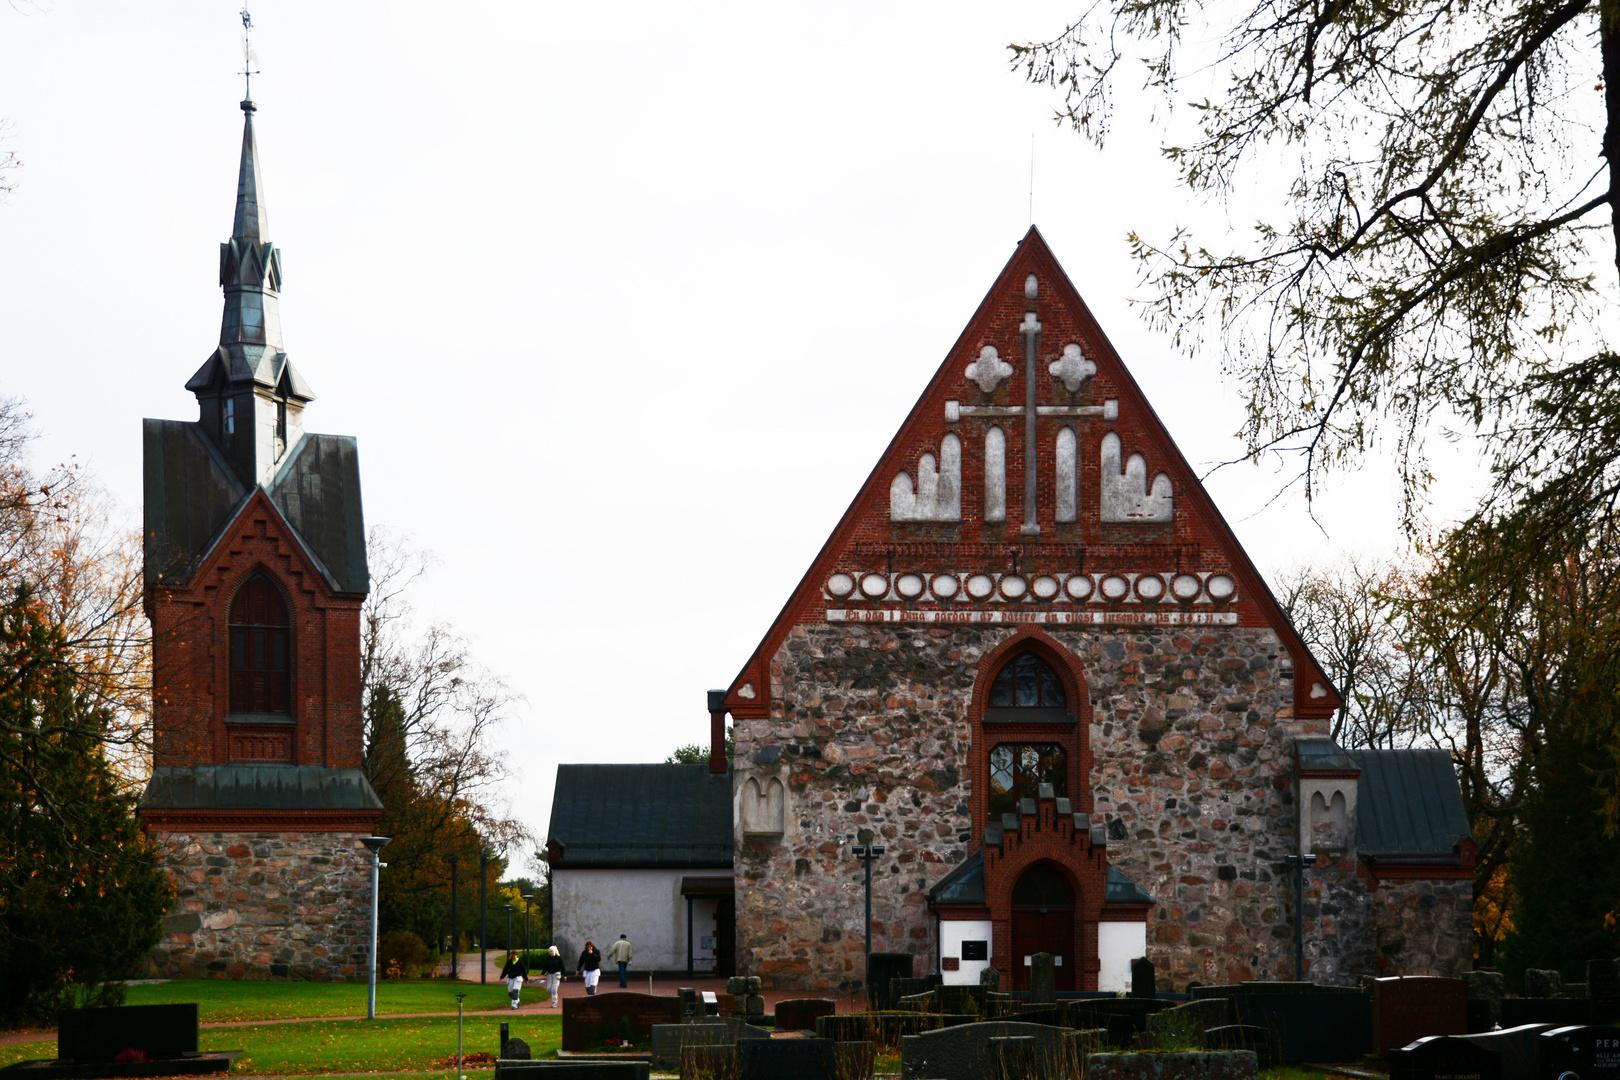 Pyhän Laurin kirkko, The Church of St. Lawrence